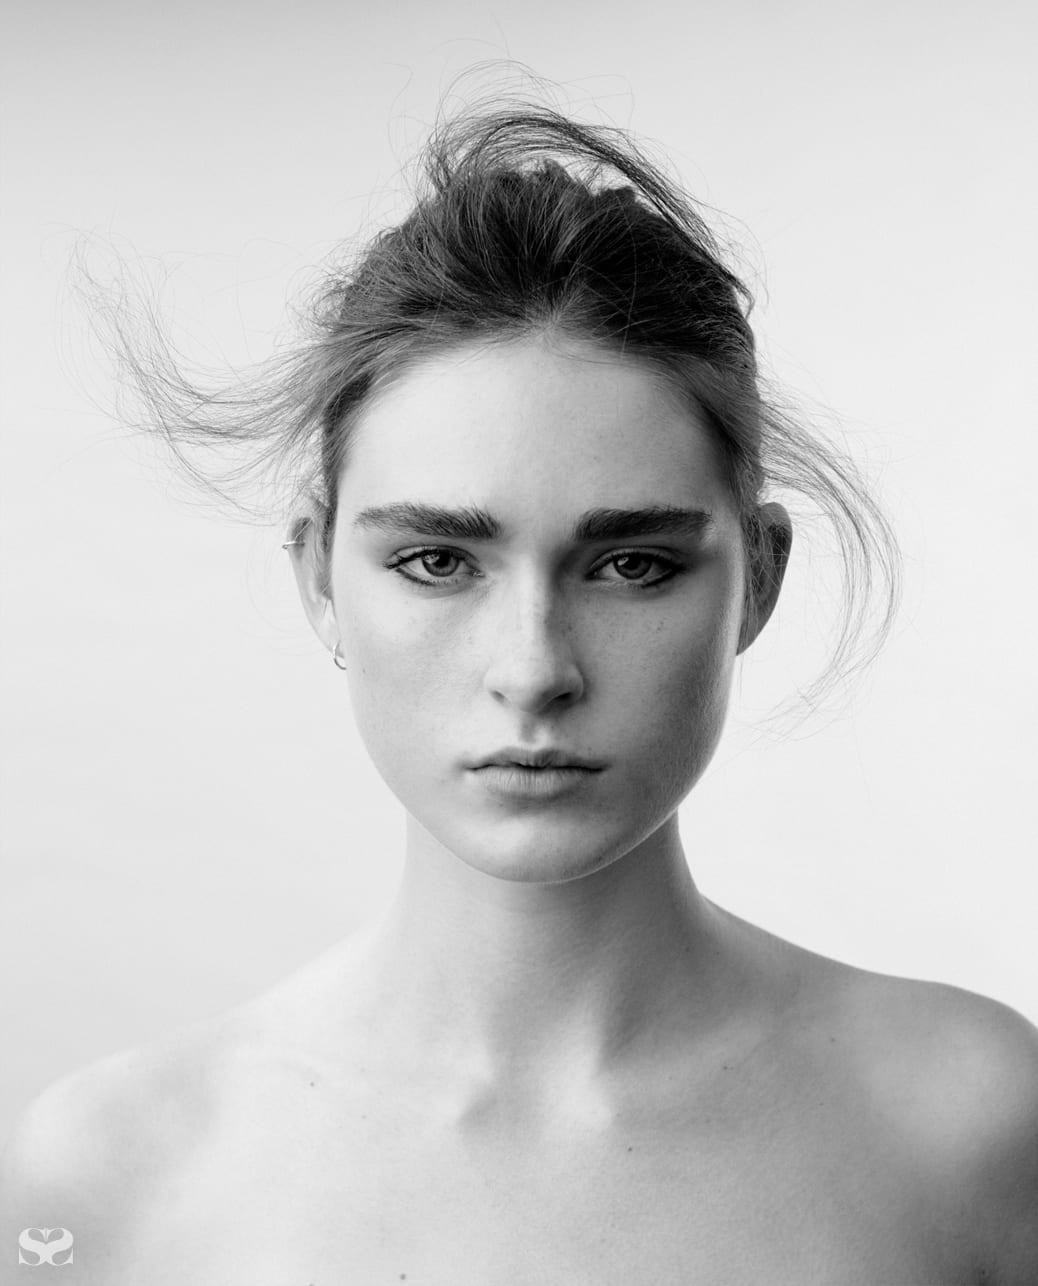 Model's own earrings (worn throughout).